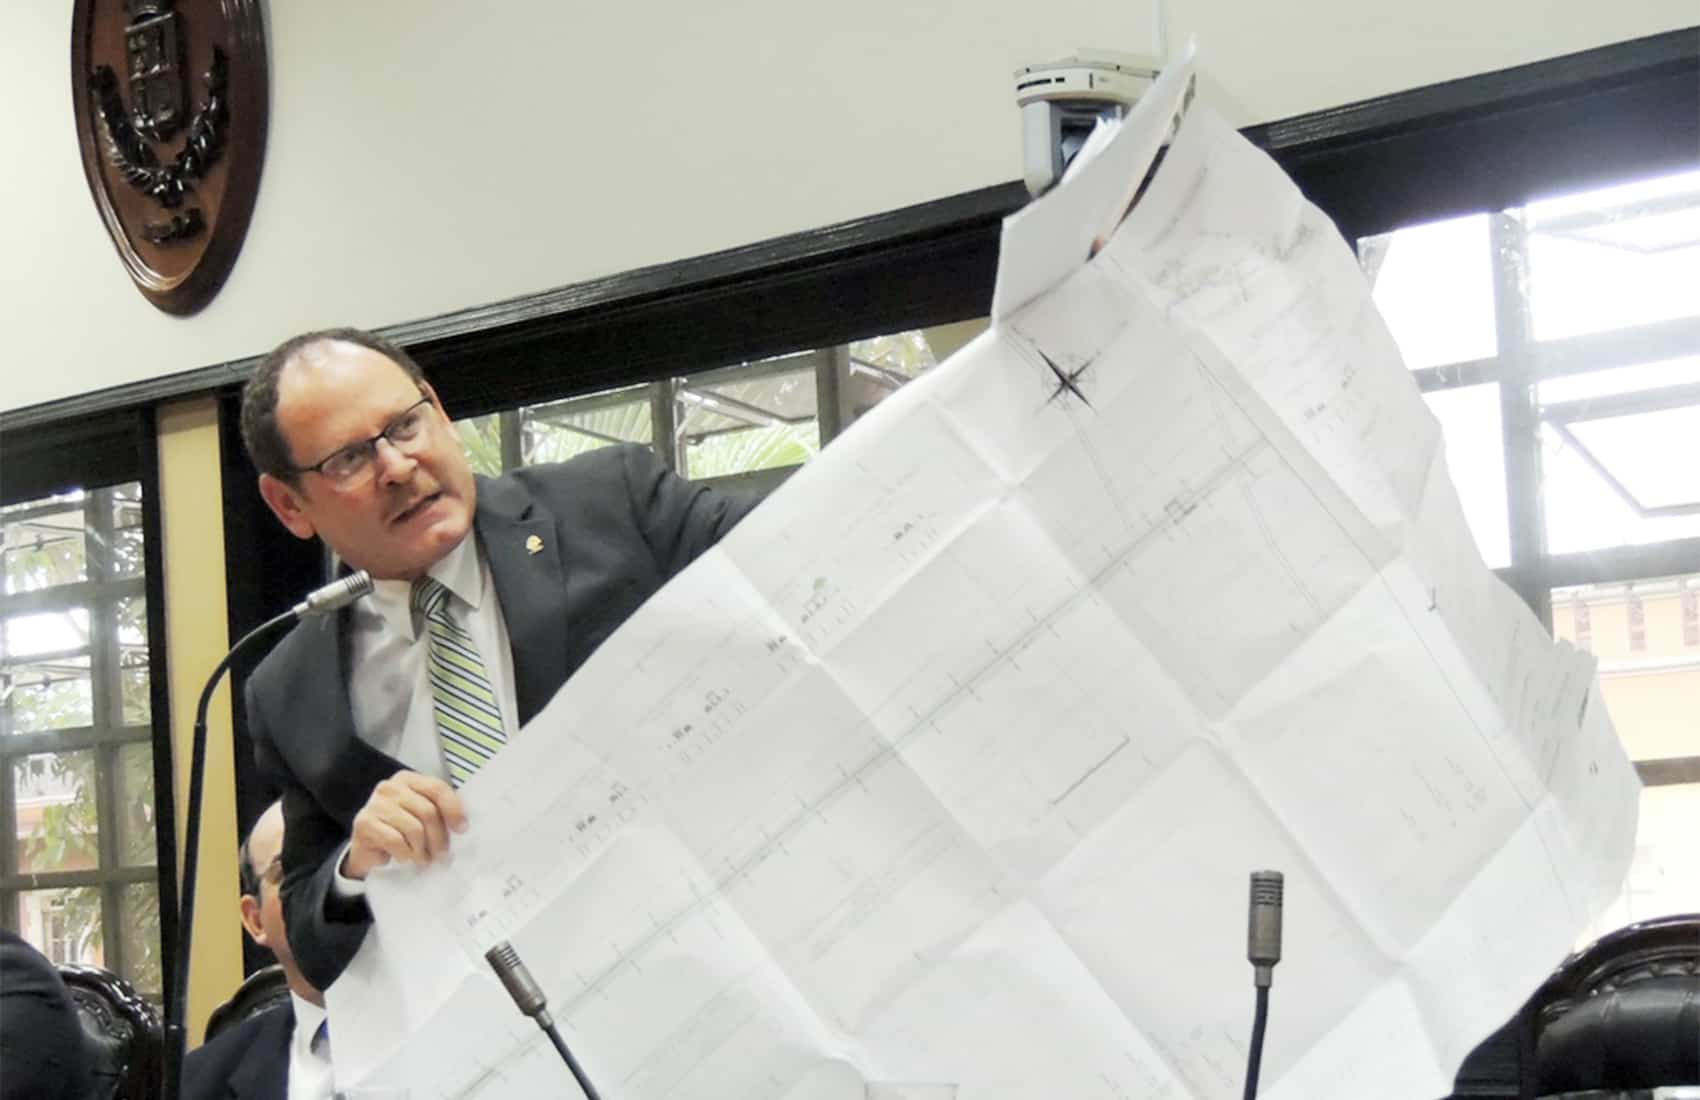 PLN lawmaker Danny Hayling Carcache